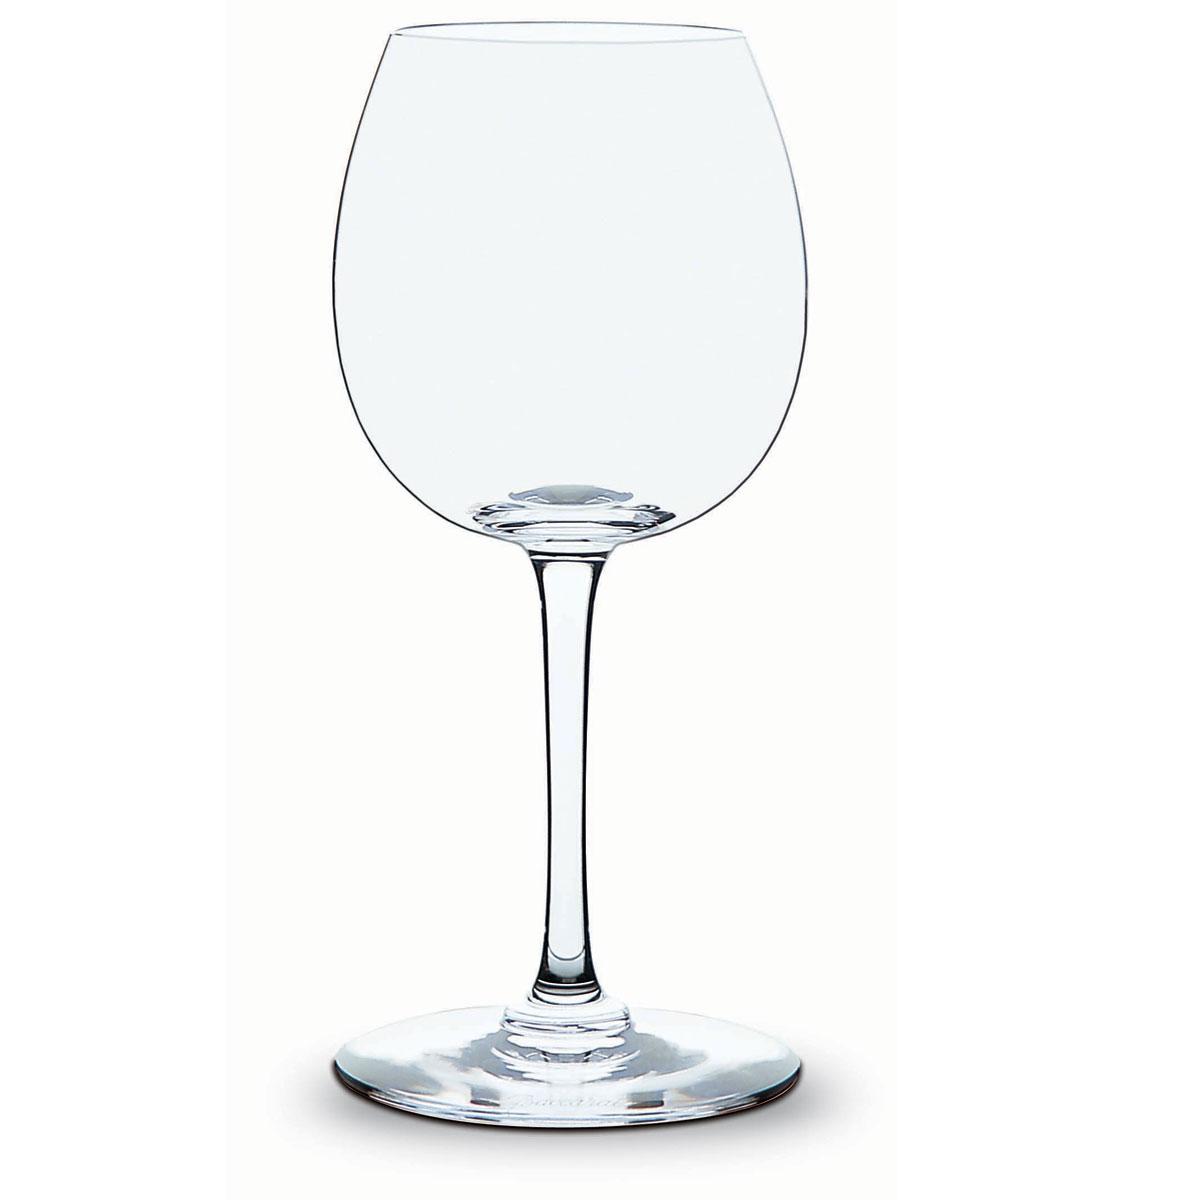 Baccarat Crystal, Oenologie Burgundy, Single